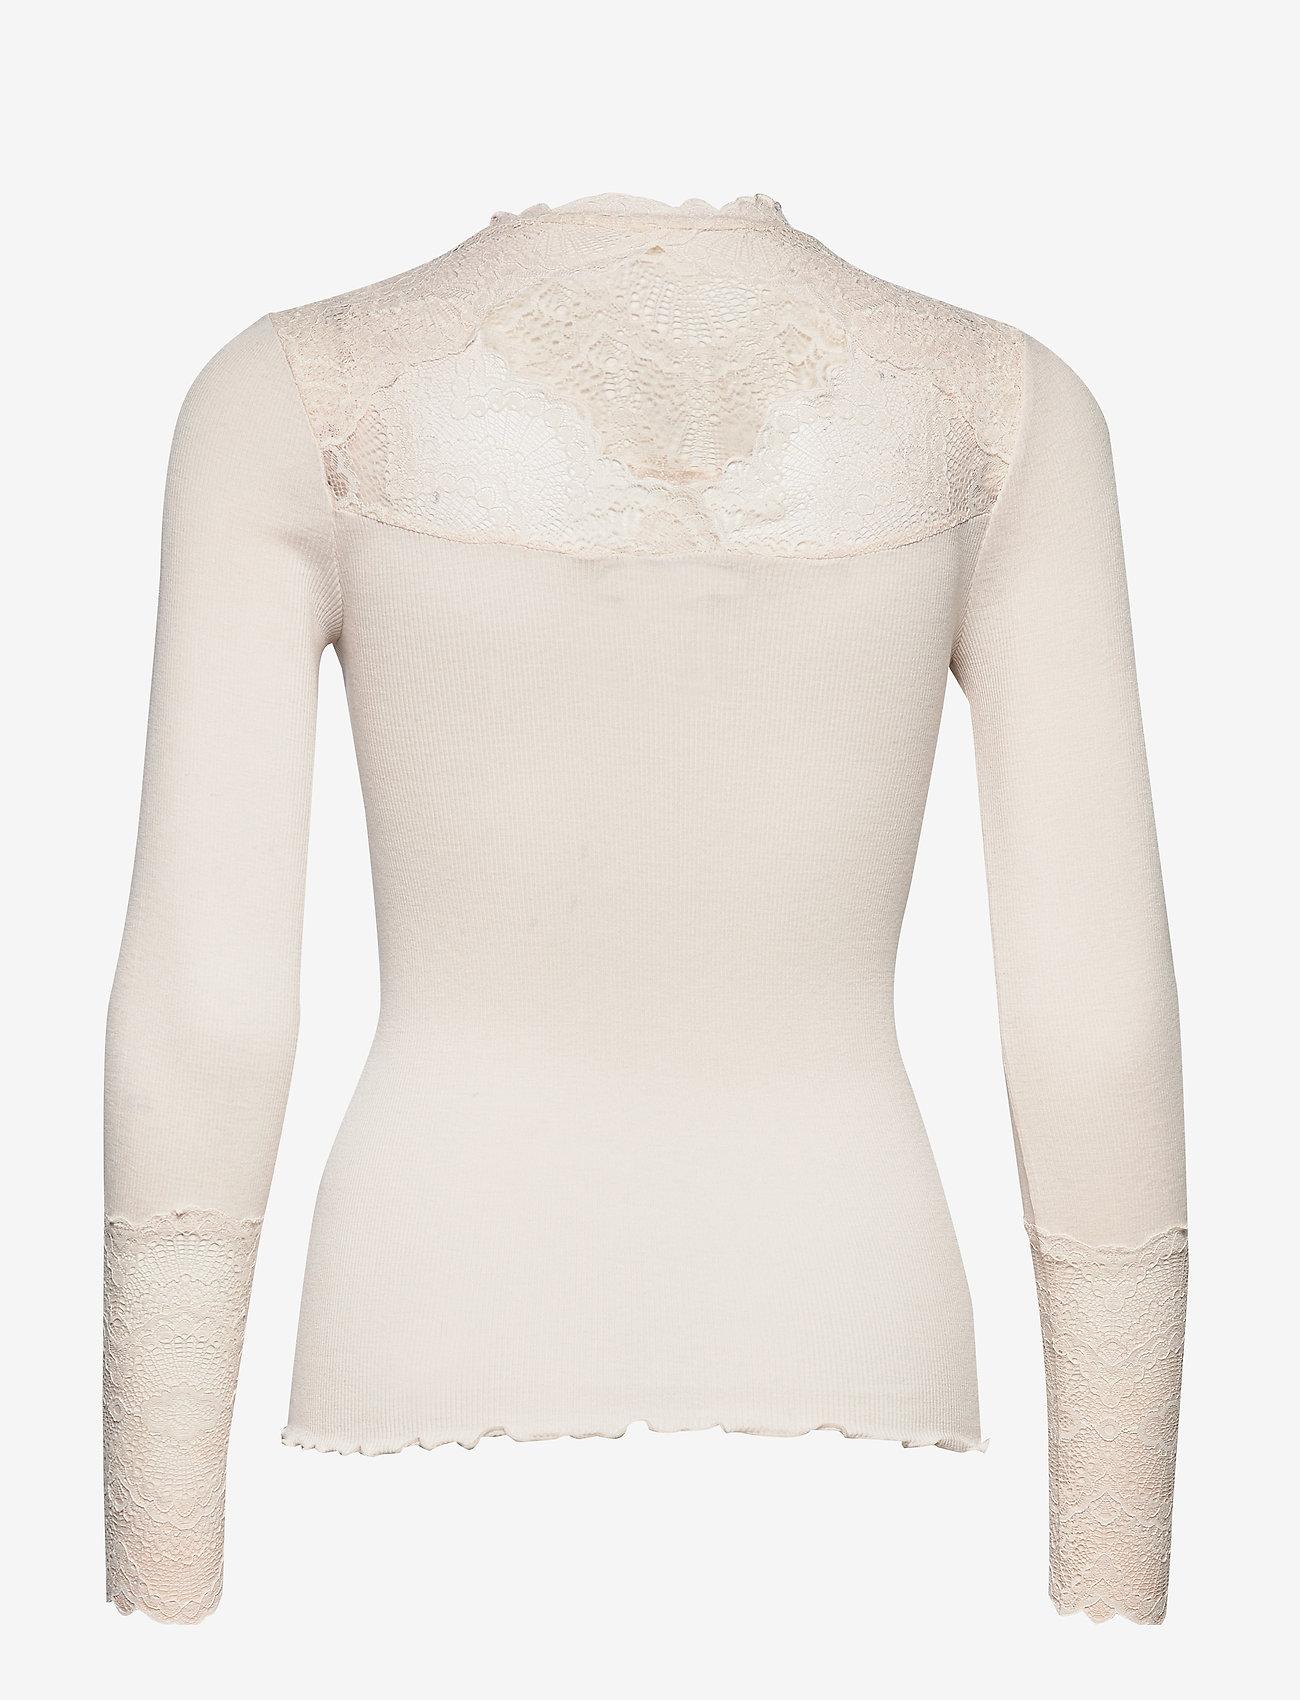 Silk T-shirt Regular Ls W/ Lace (Soft Powder) - Rosemunde vHy0vZ